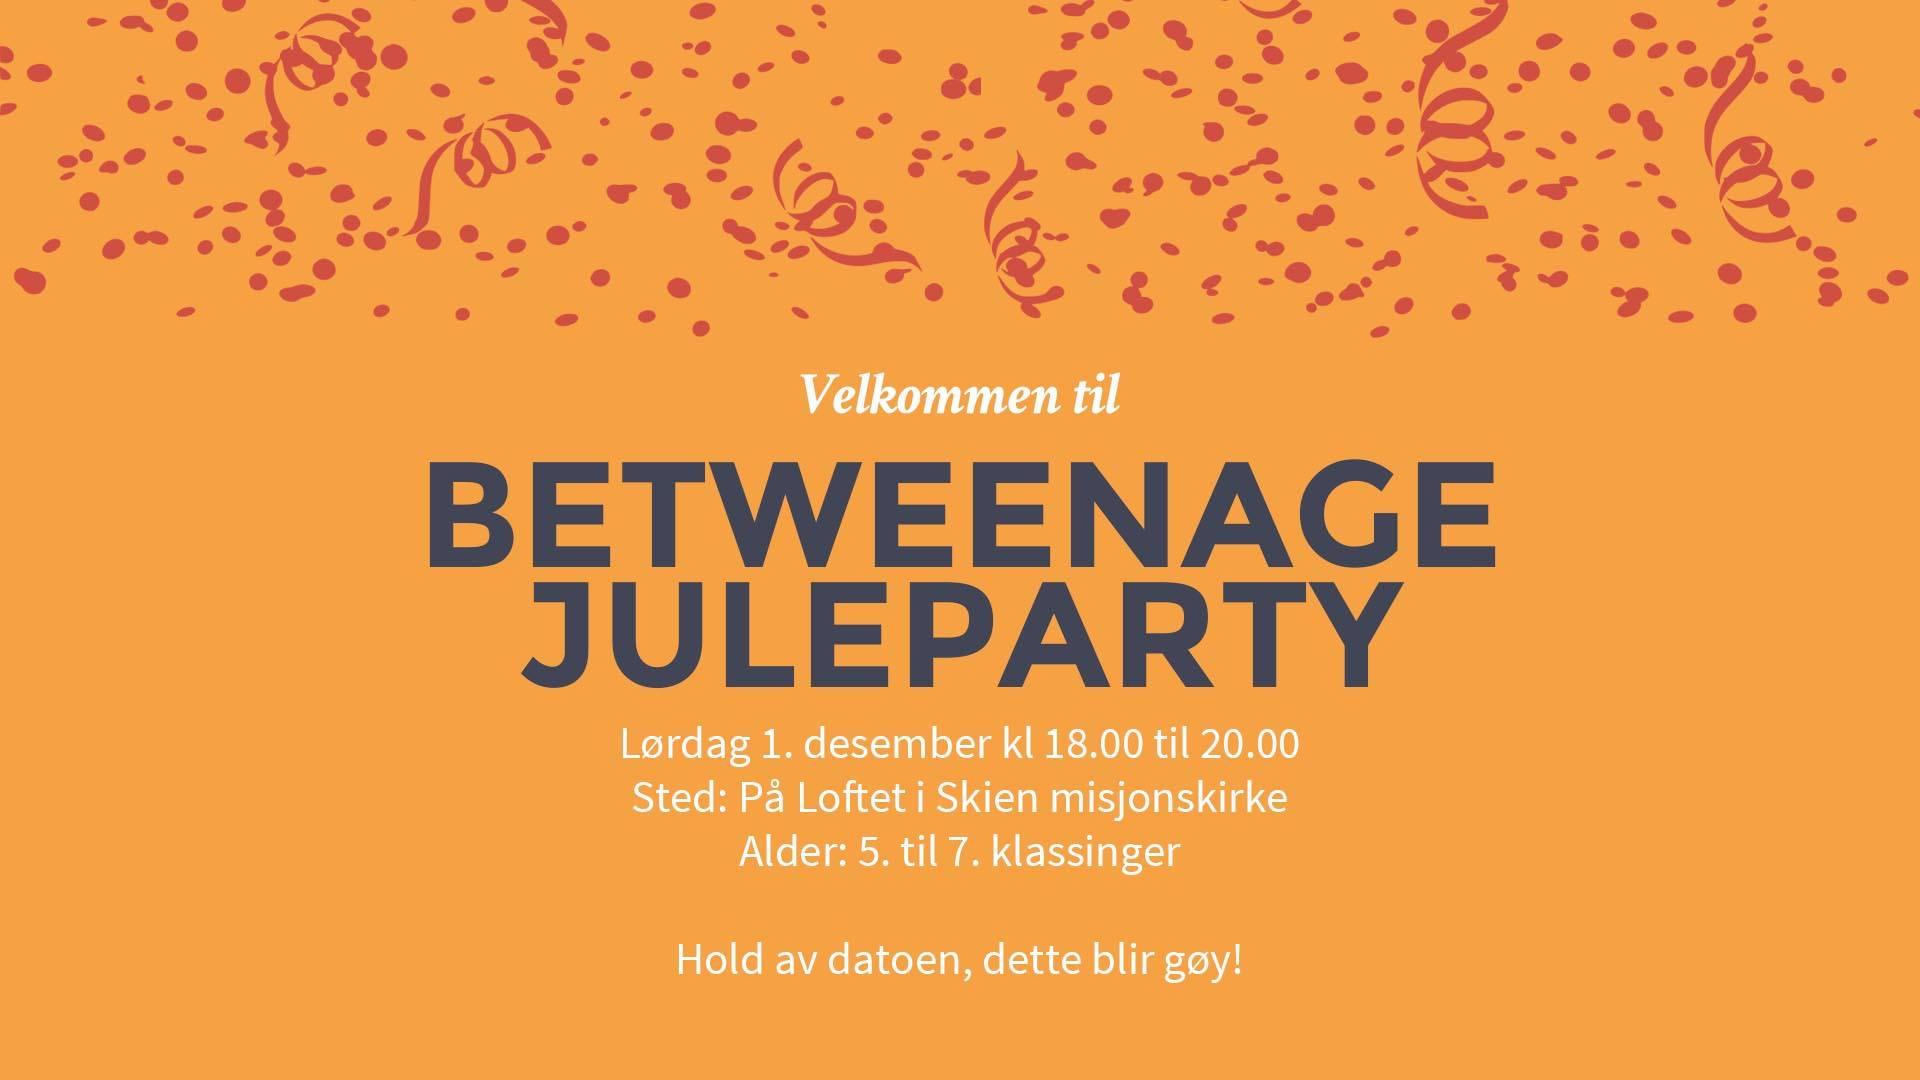 Btweenage-party desember